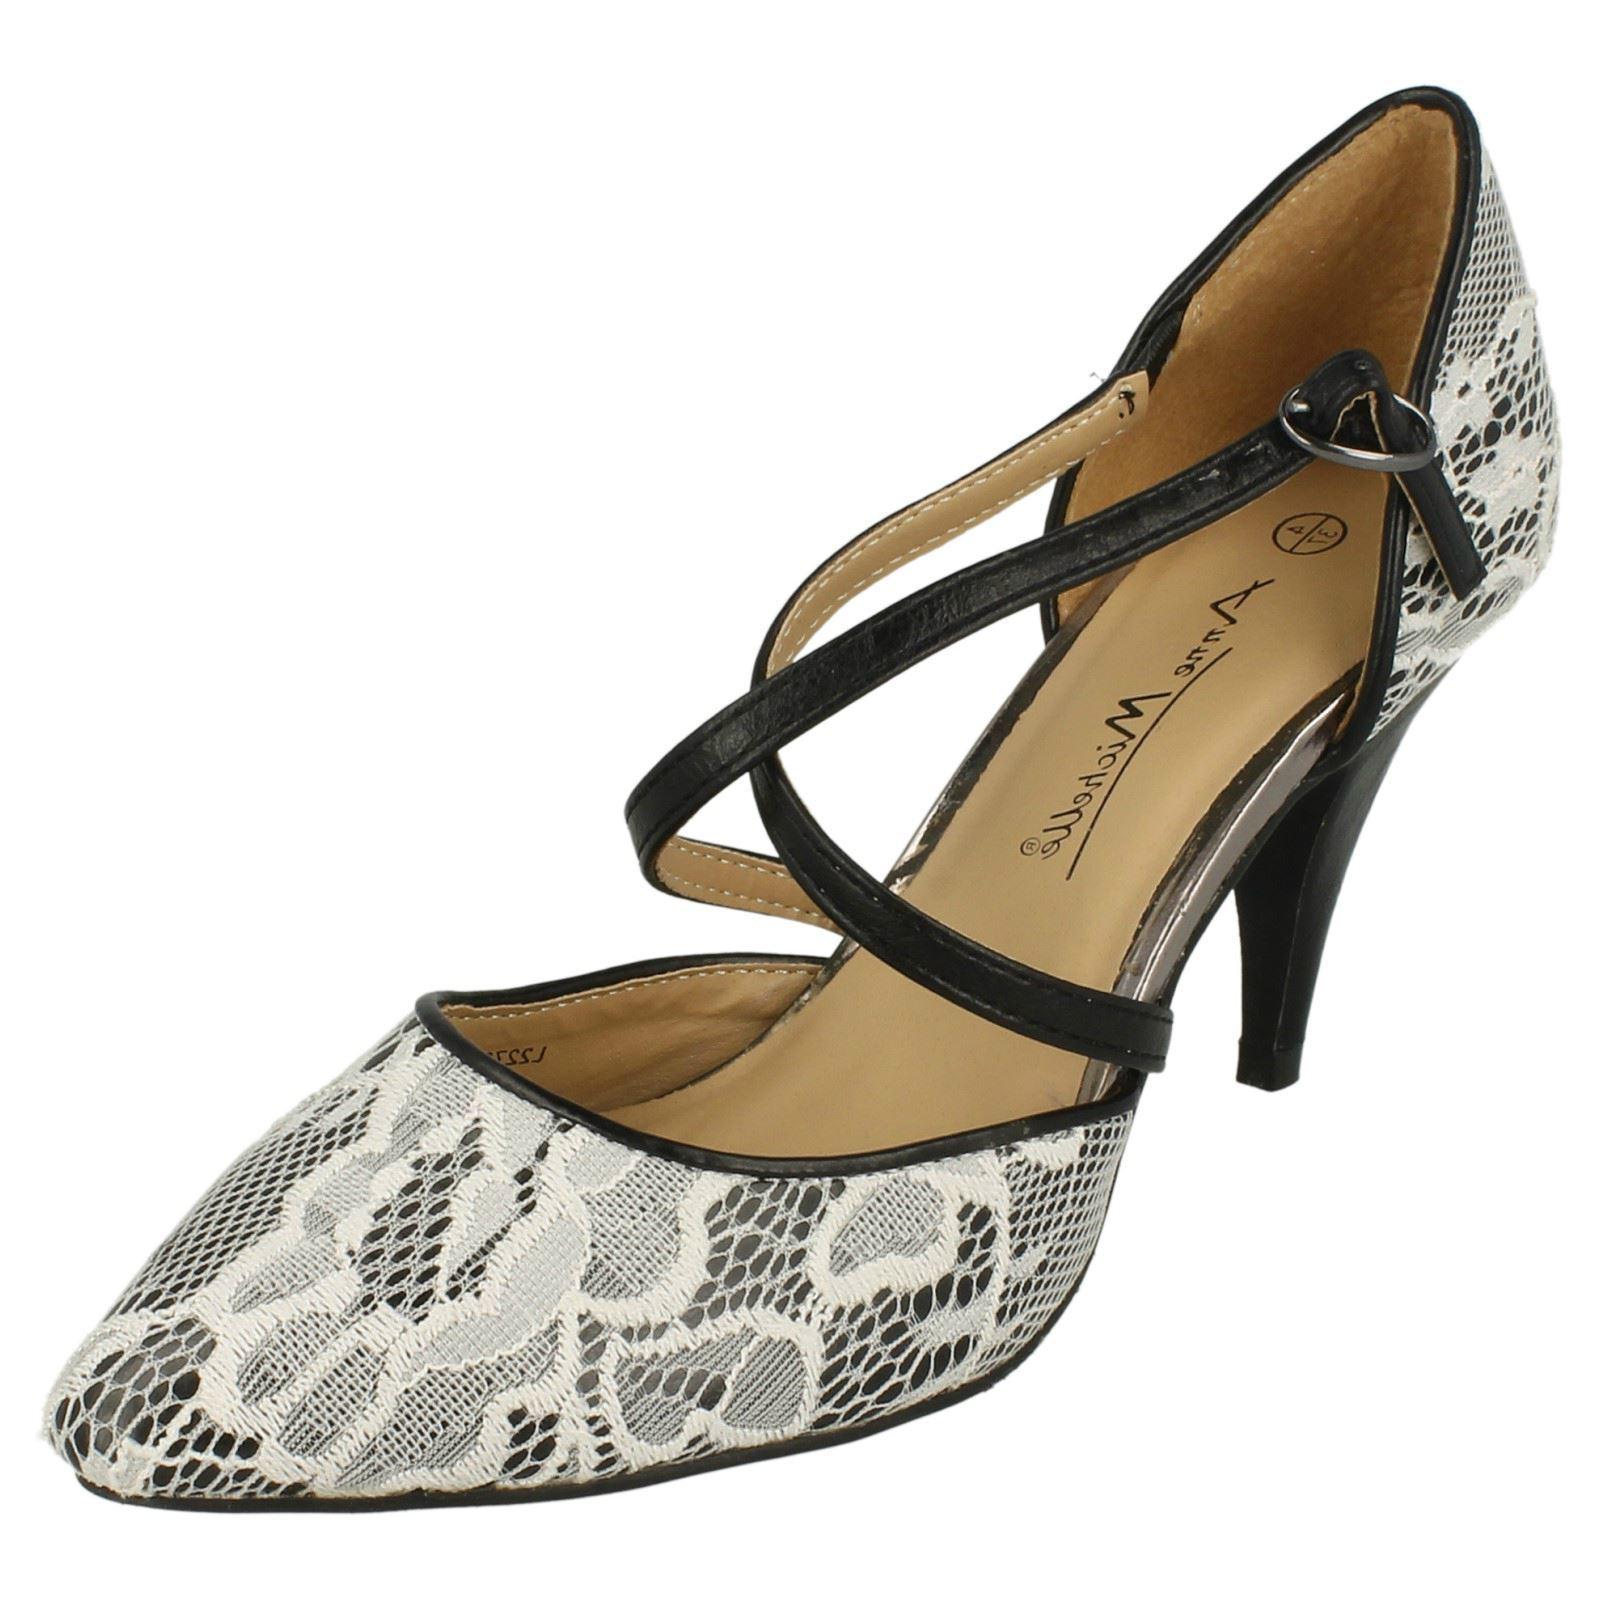 Anne Michelle L2273 Ladies Black and Ice Lace Court Shoe (32A) (Kett)